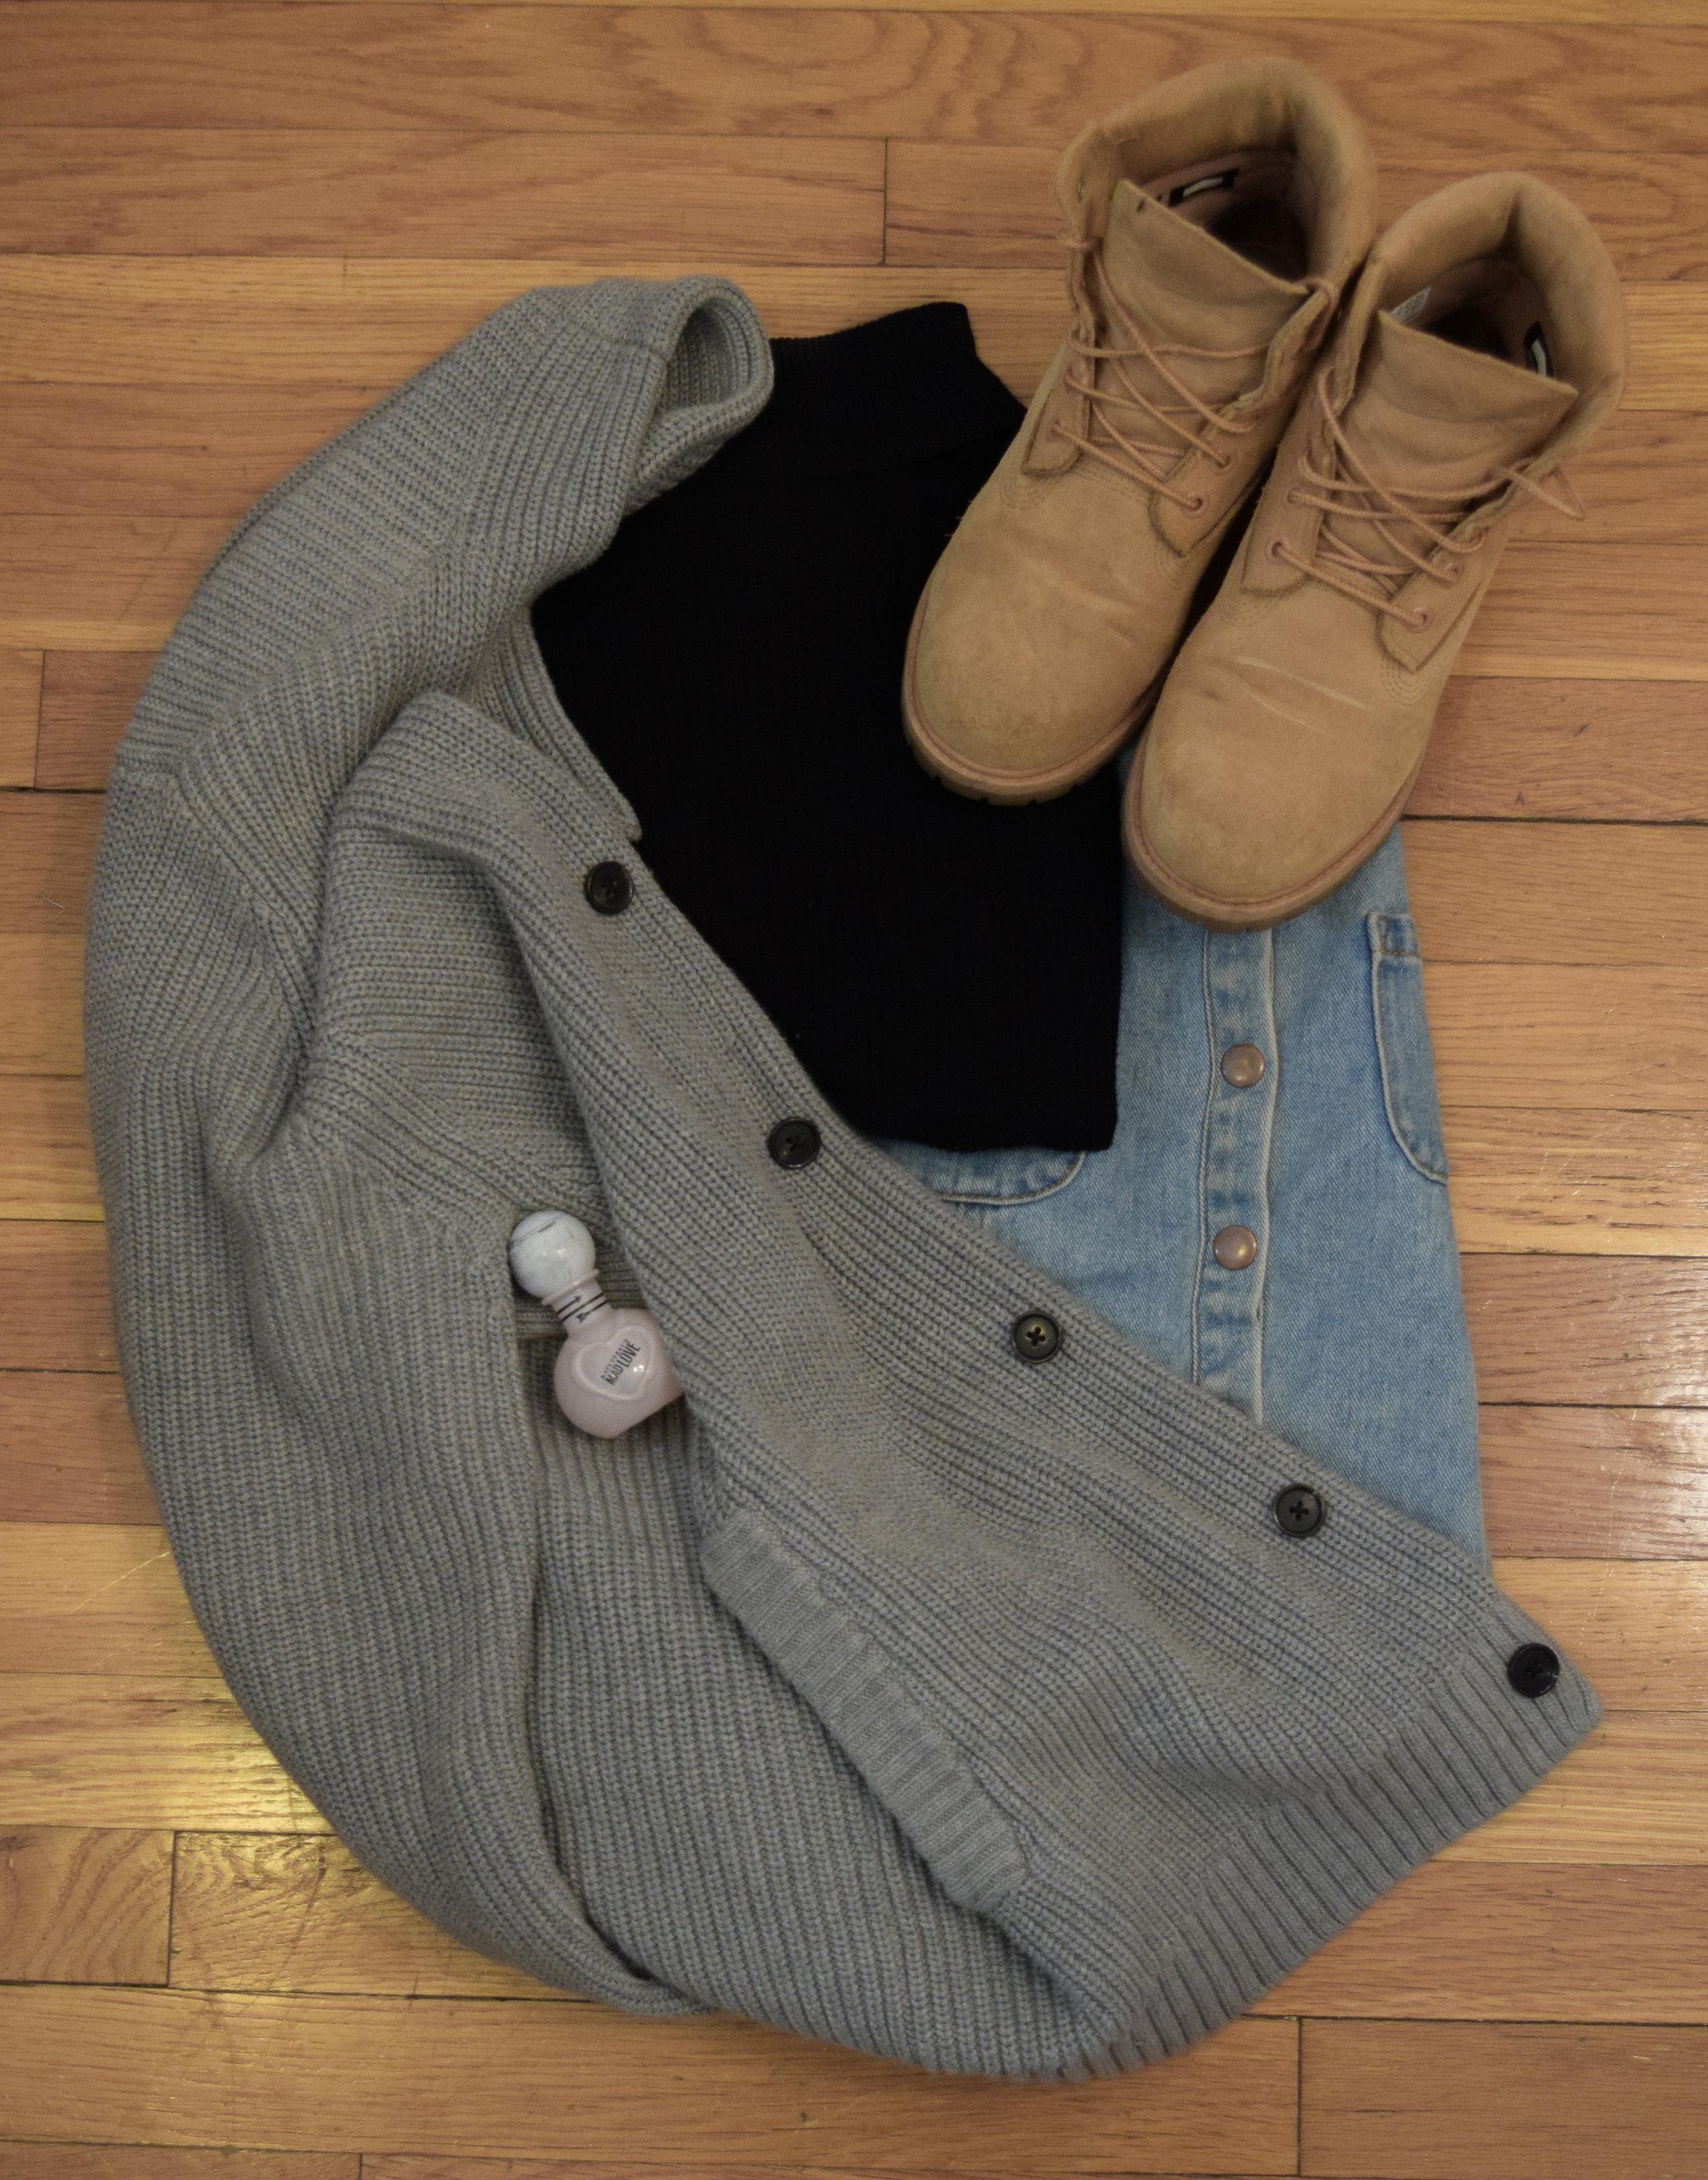 turtleneck .  skirt .  sweater .  boots .  perfume .